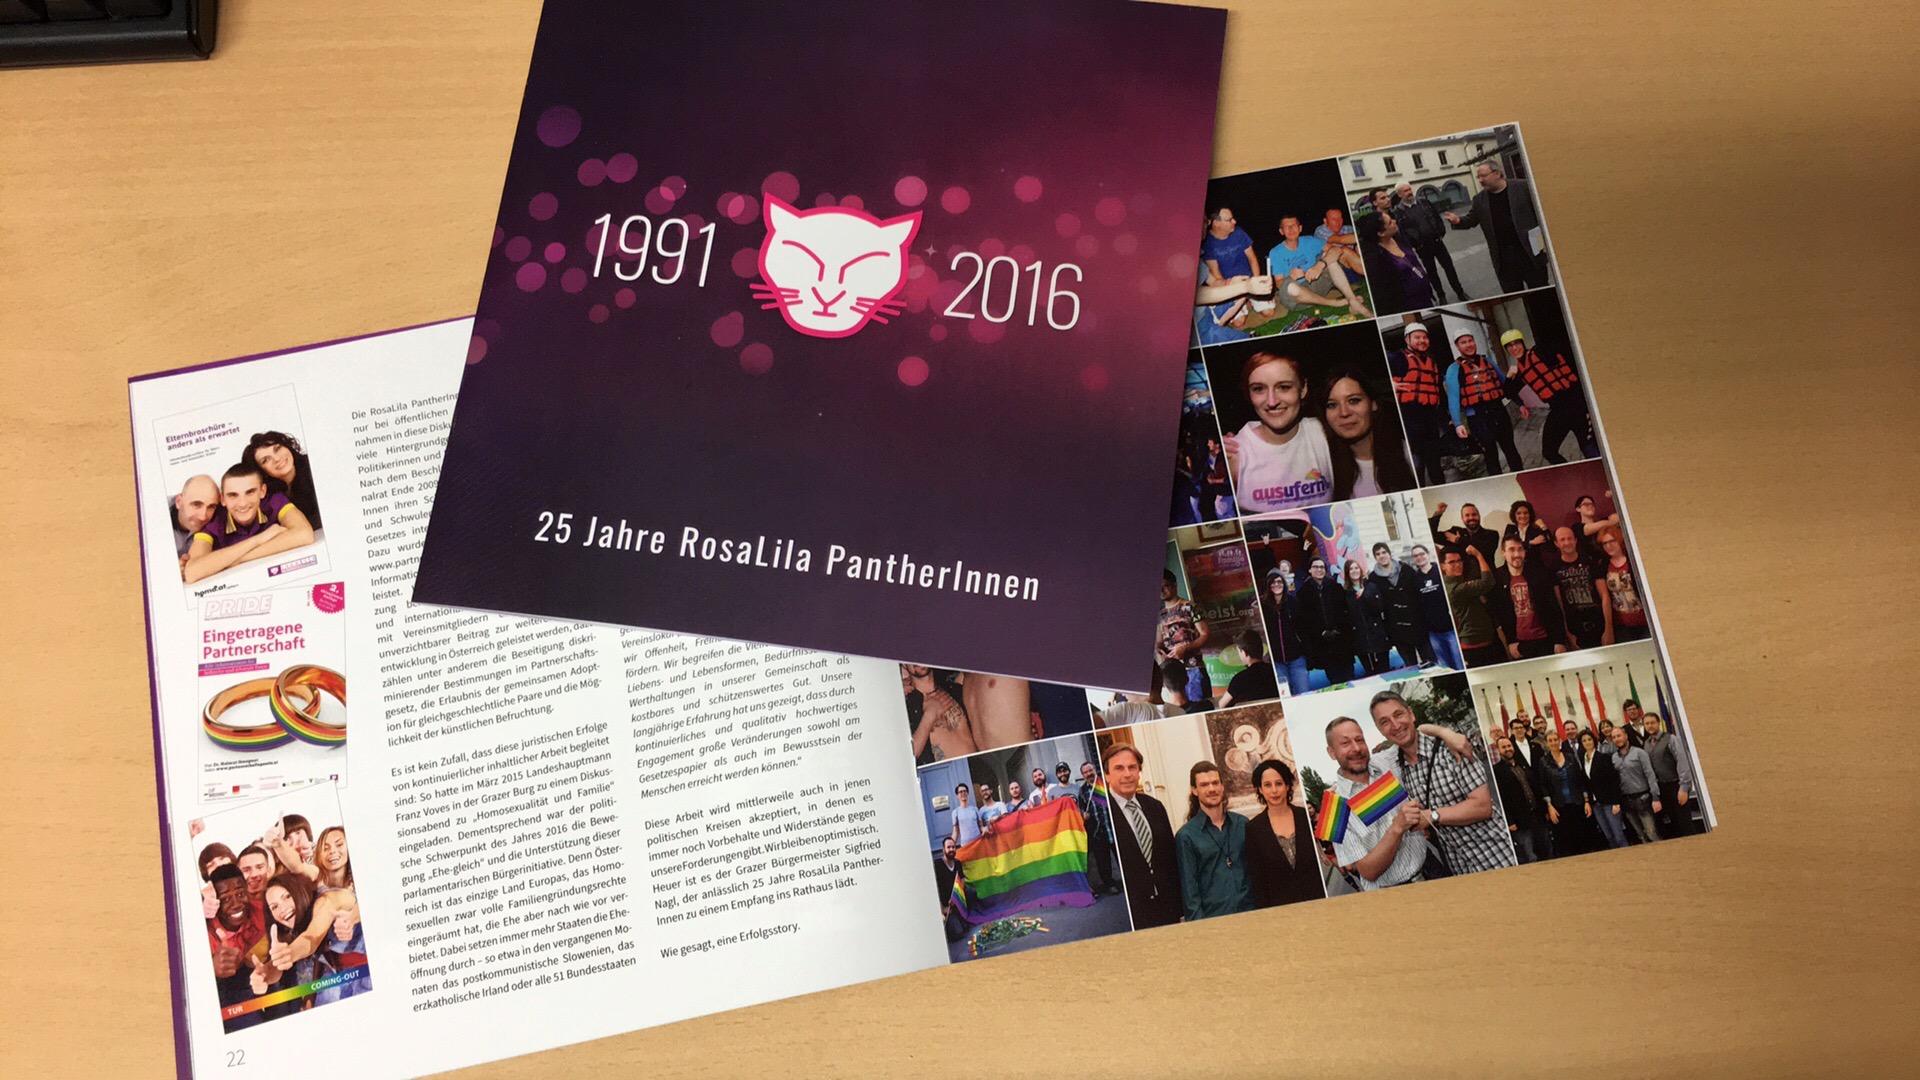 Festschrift zum Jubiläum der RosaLila PantherInenn